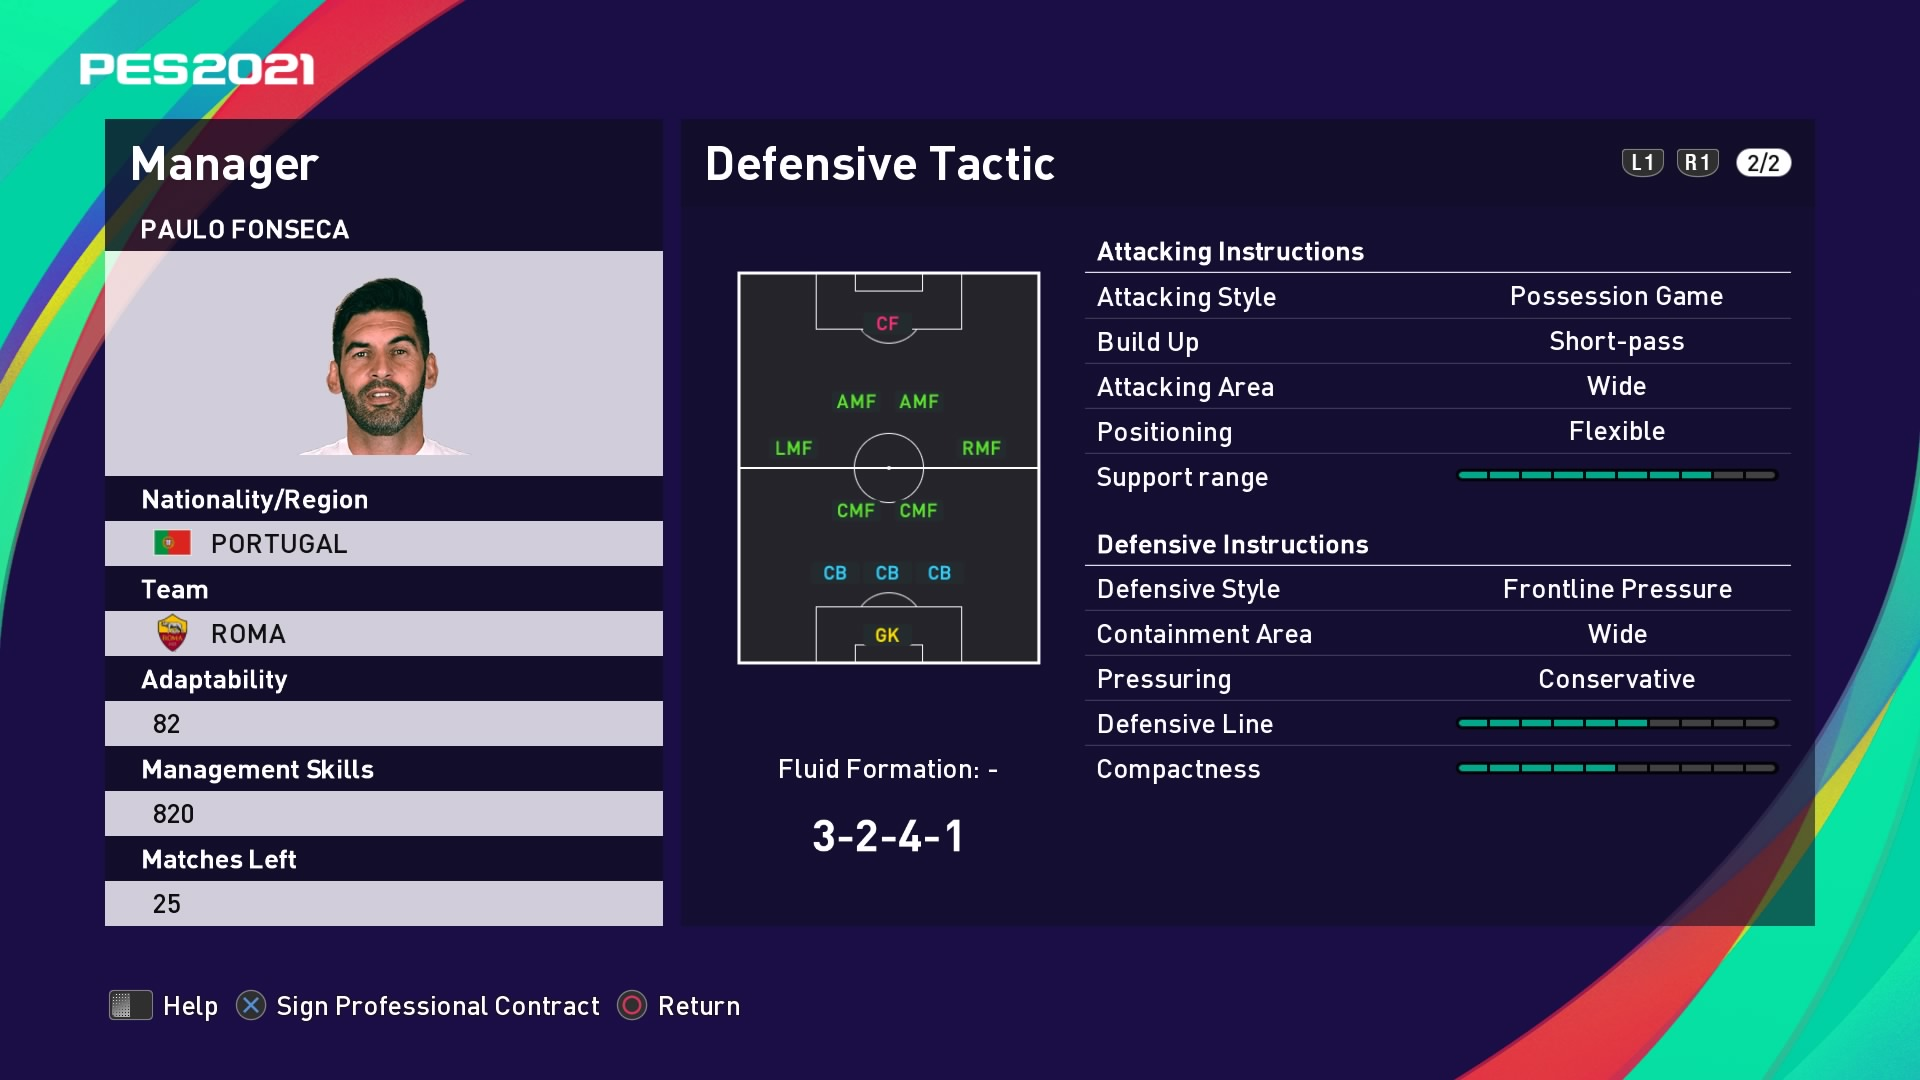 Paulo Fonseca (2) Defensive Tactic in PES 2021 myClub